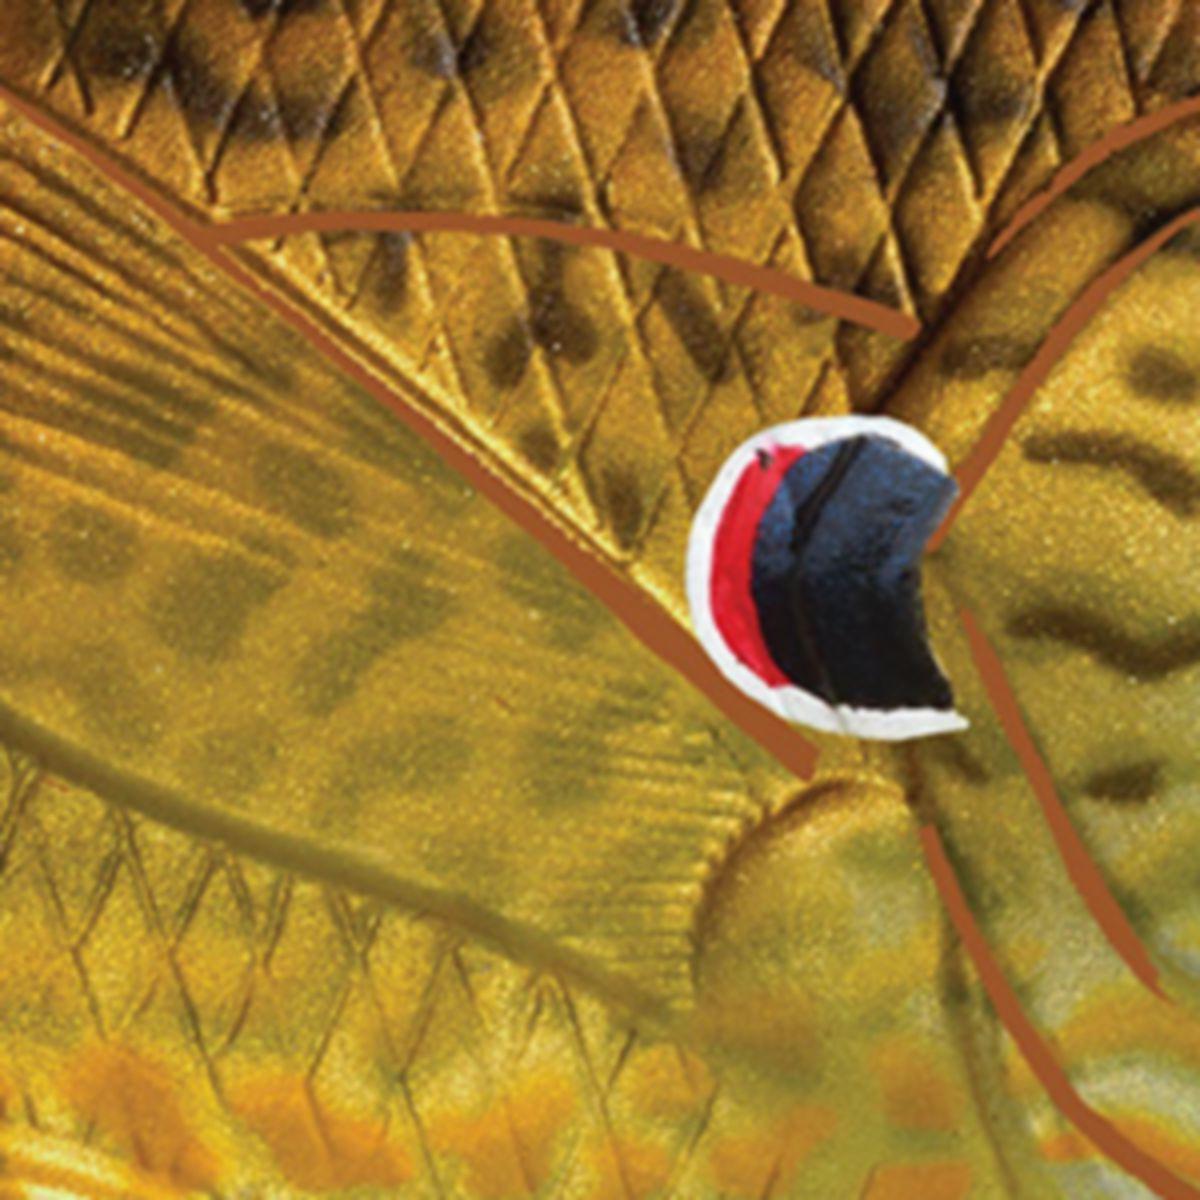 Livetarget® Sunfish Hollow Body